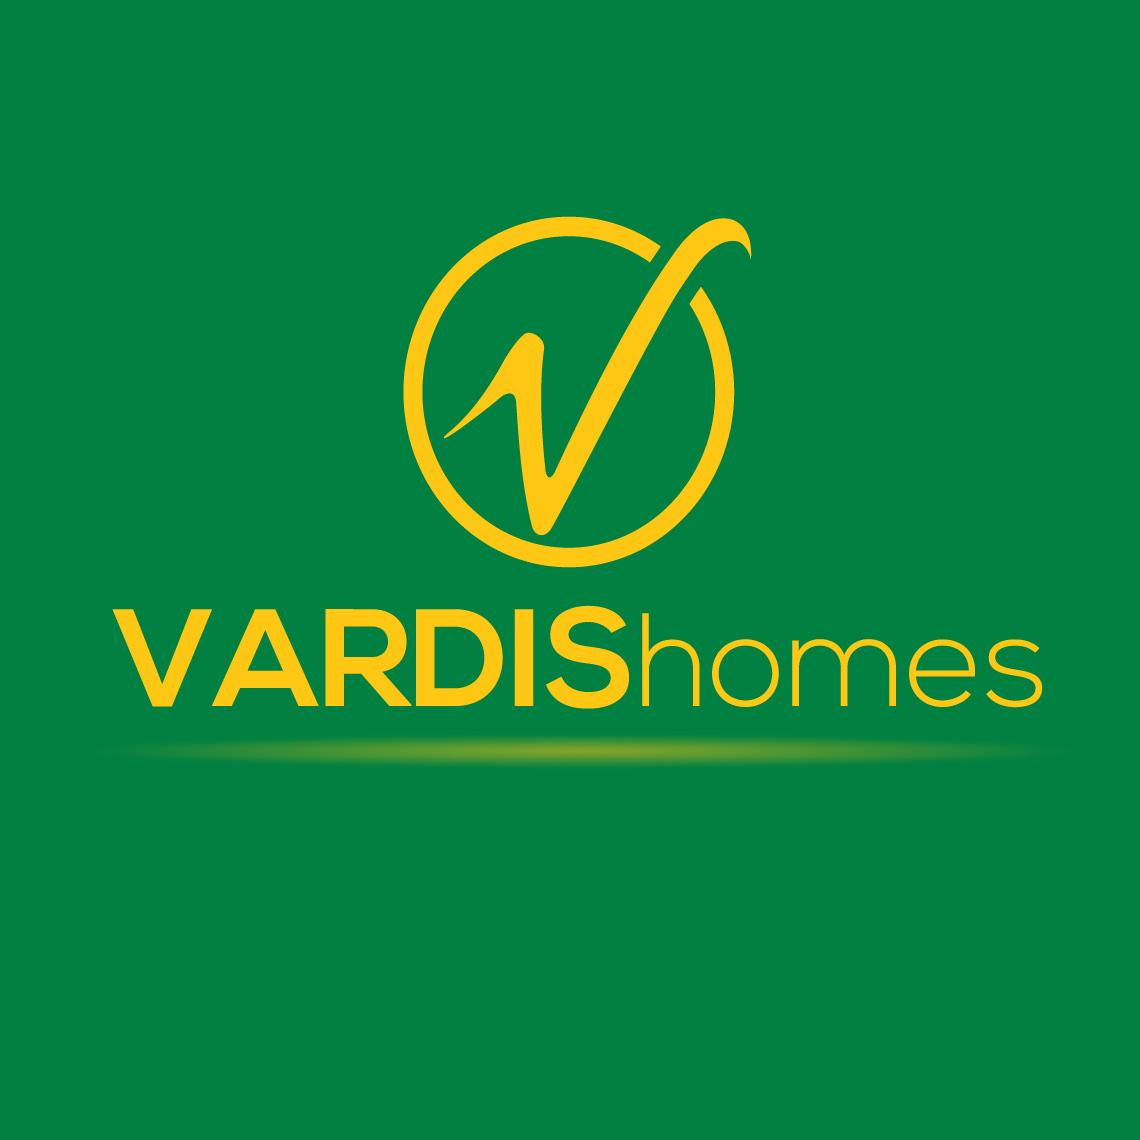 vardishomes